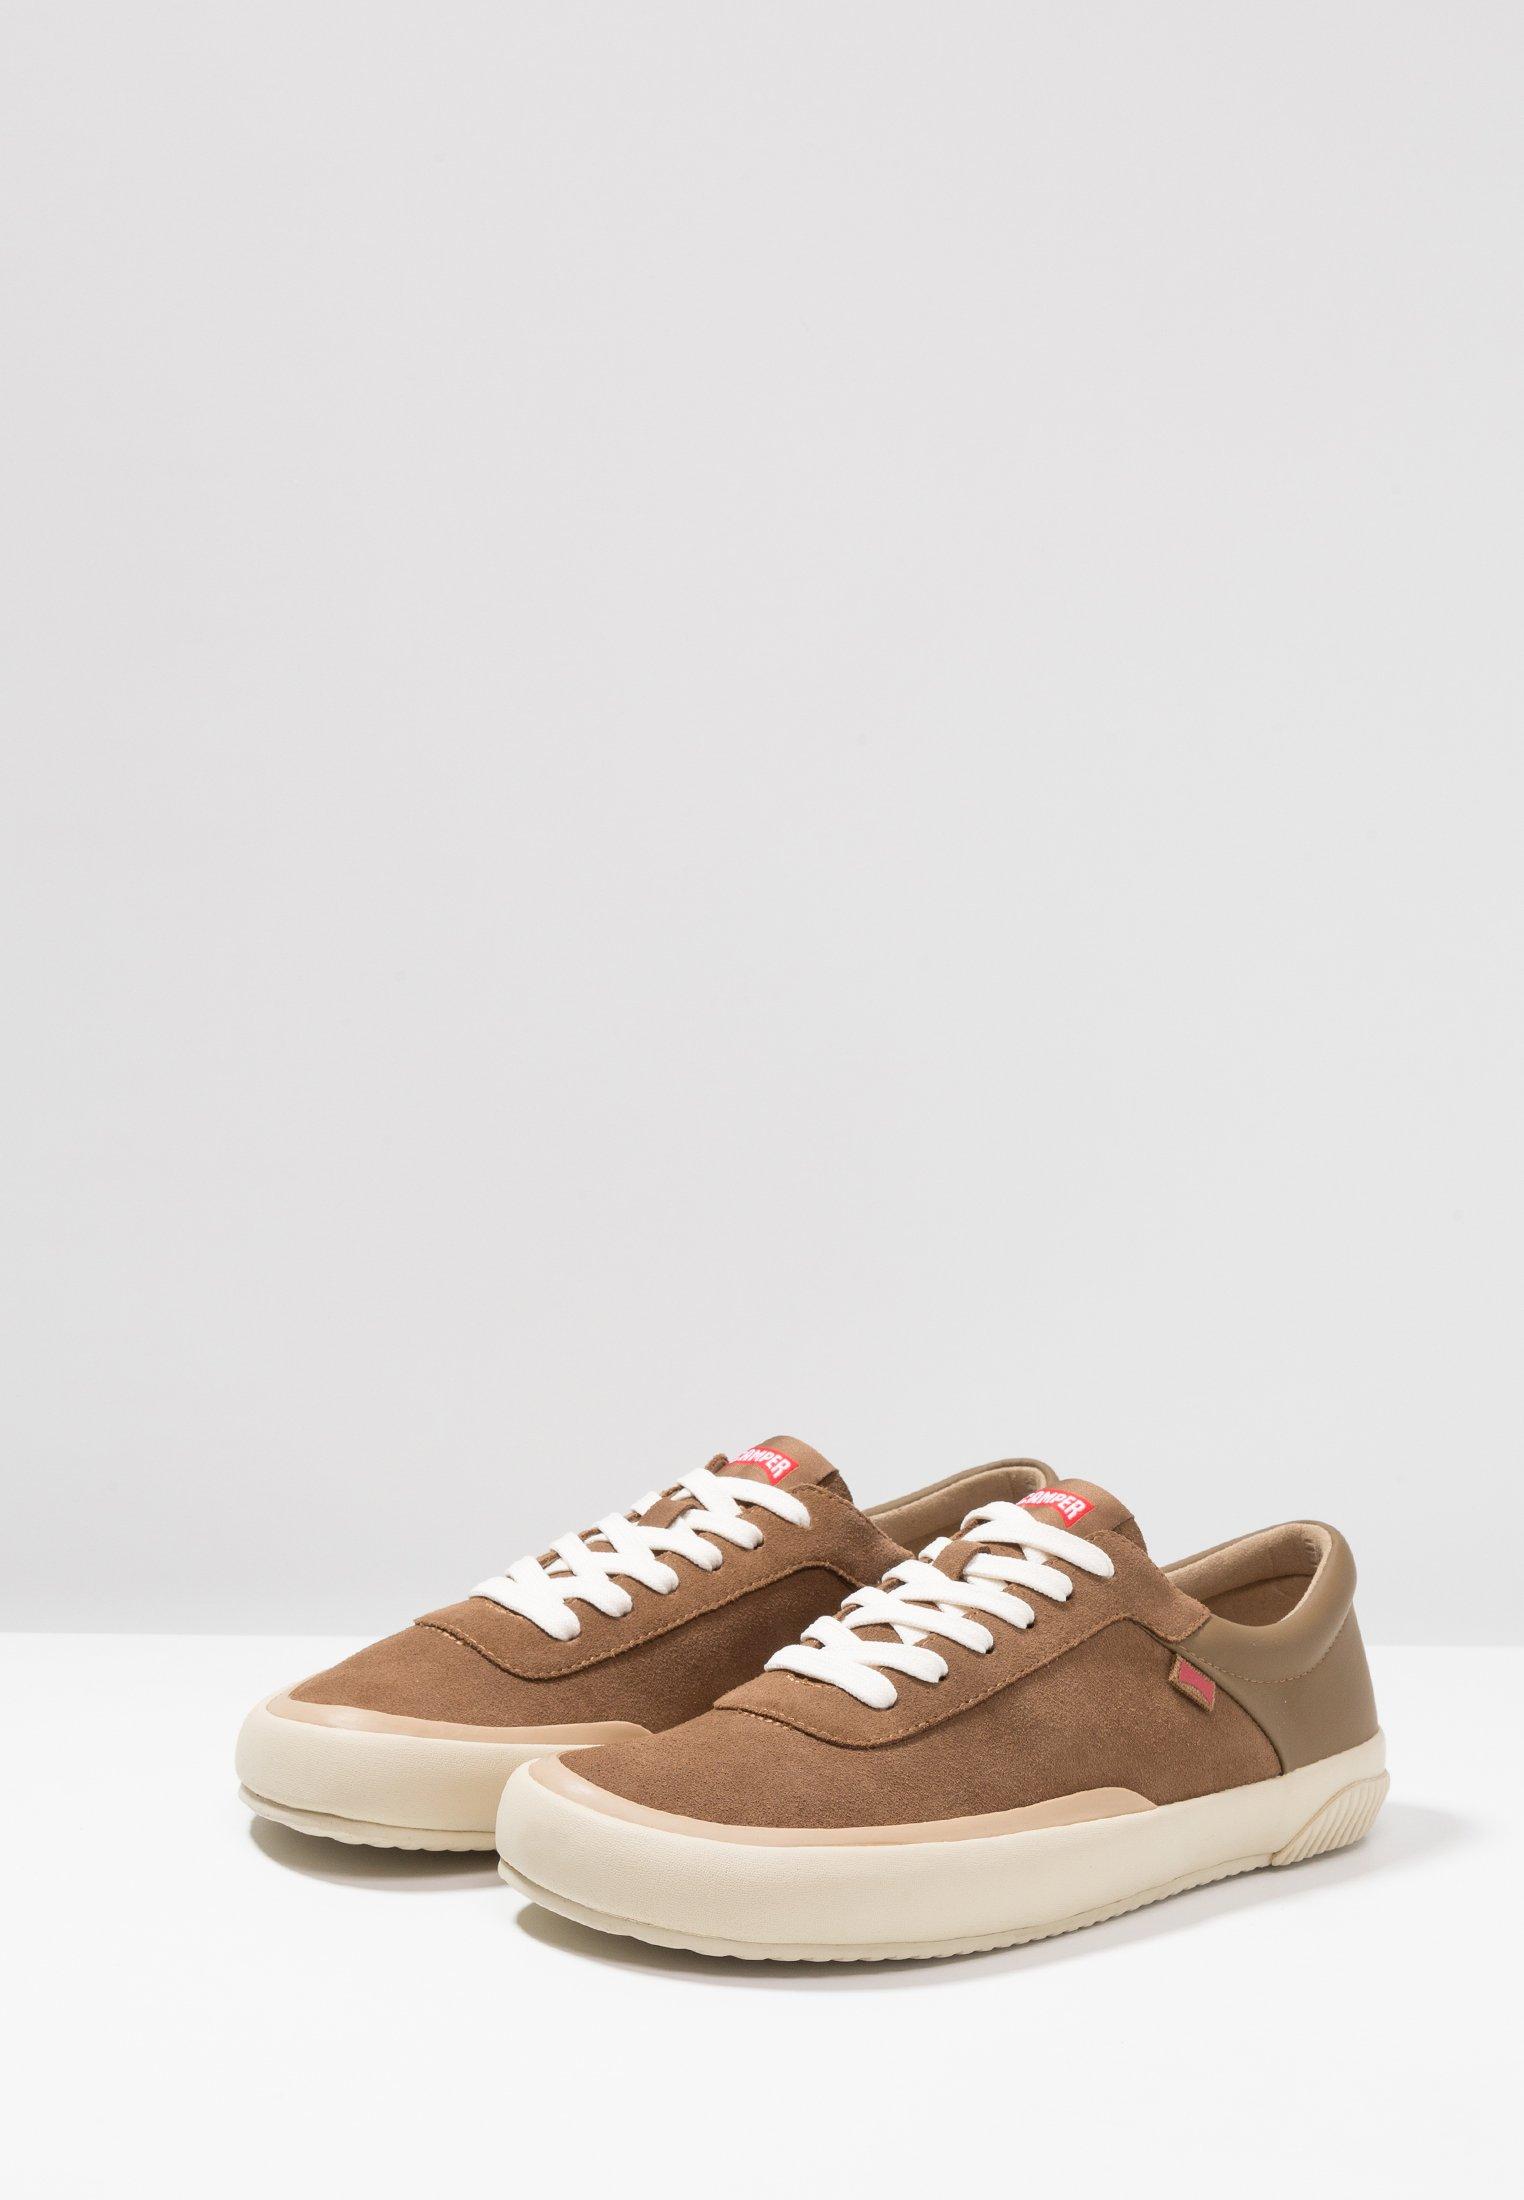 Camper PEU RAMBLA - Sneaker low - medium brown/braun - Herrenschuhe eClr3